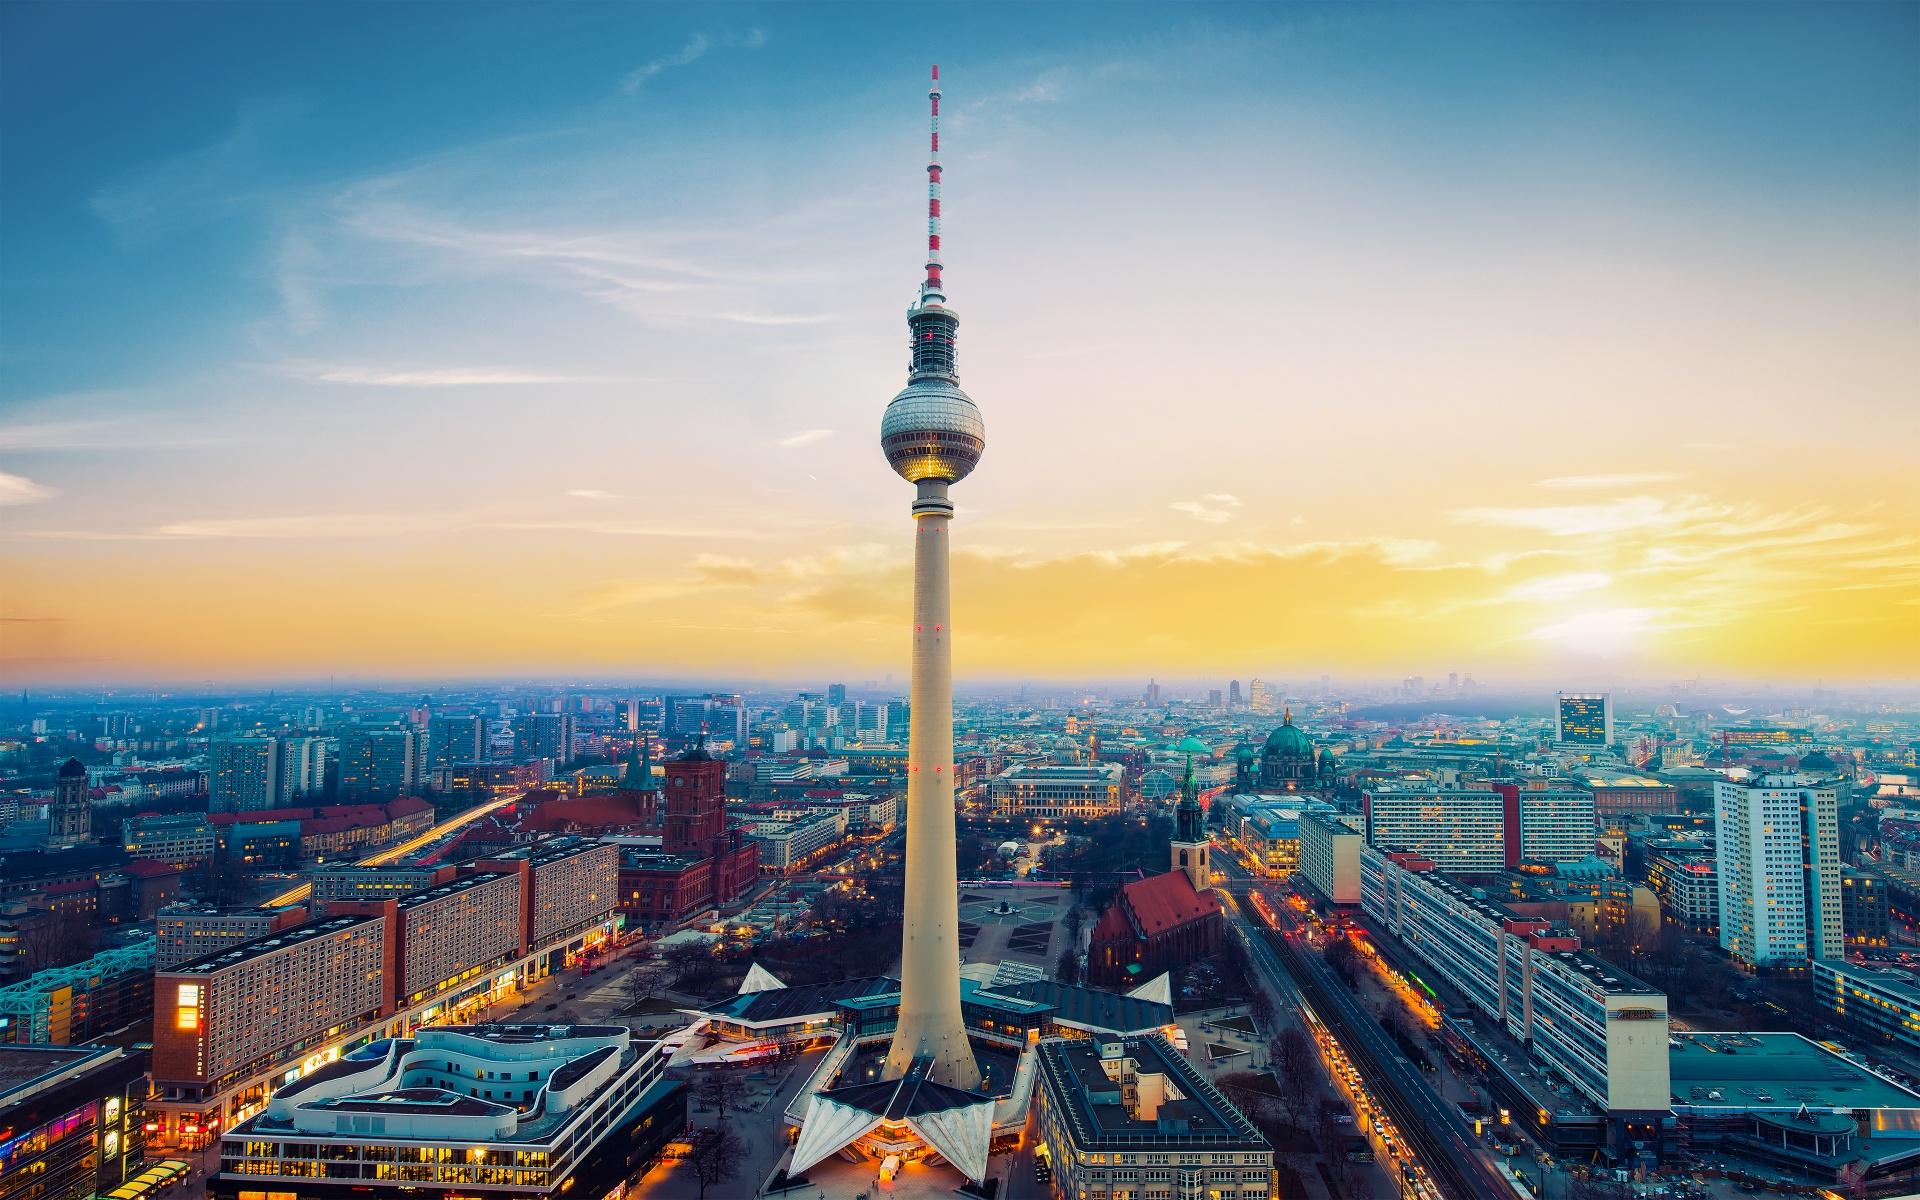 Fernsehturm Berlin Tv Tower Germany Wallpapers In Jpg Format For